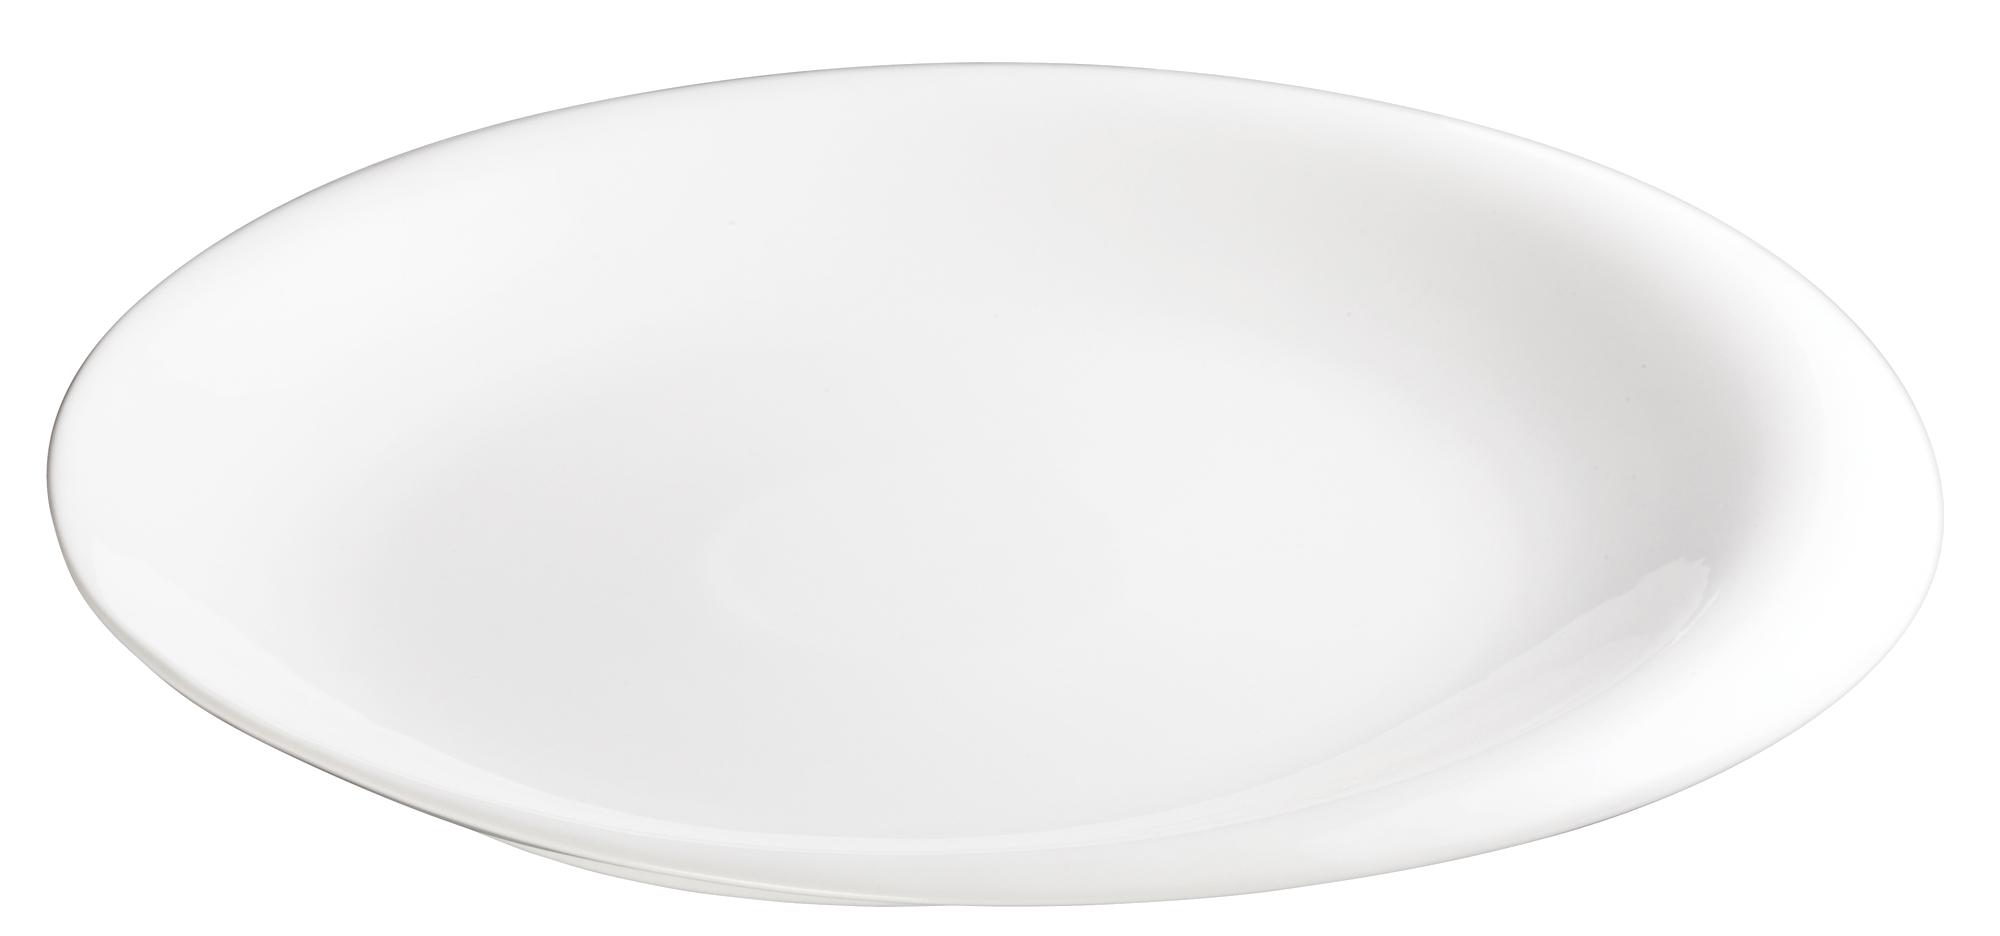 Winco WDP004-204 plate, china